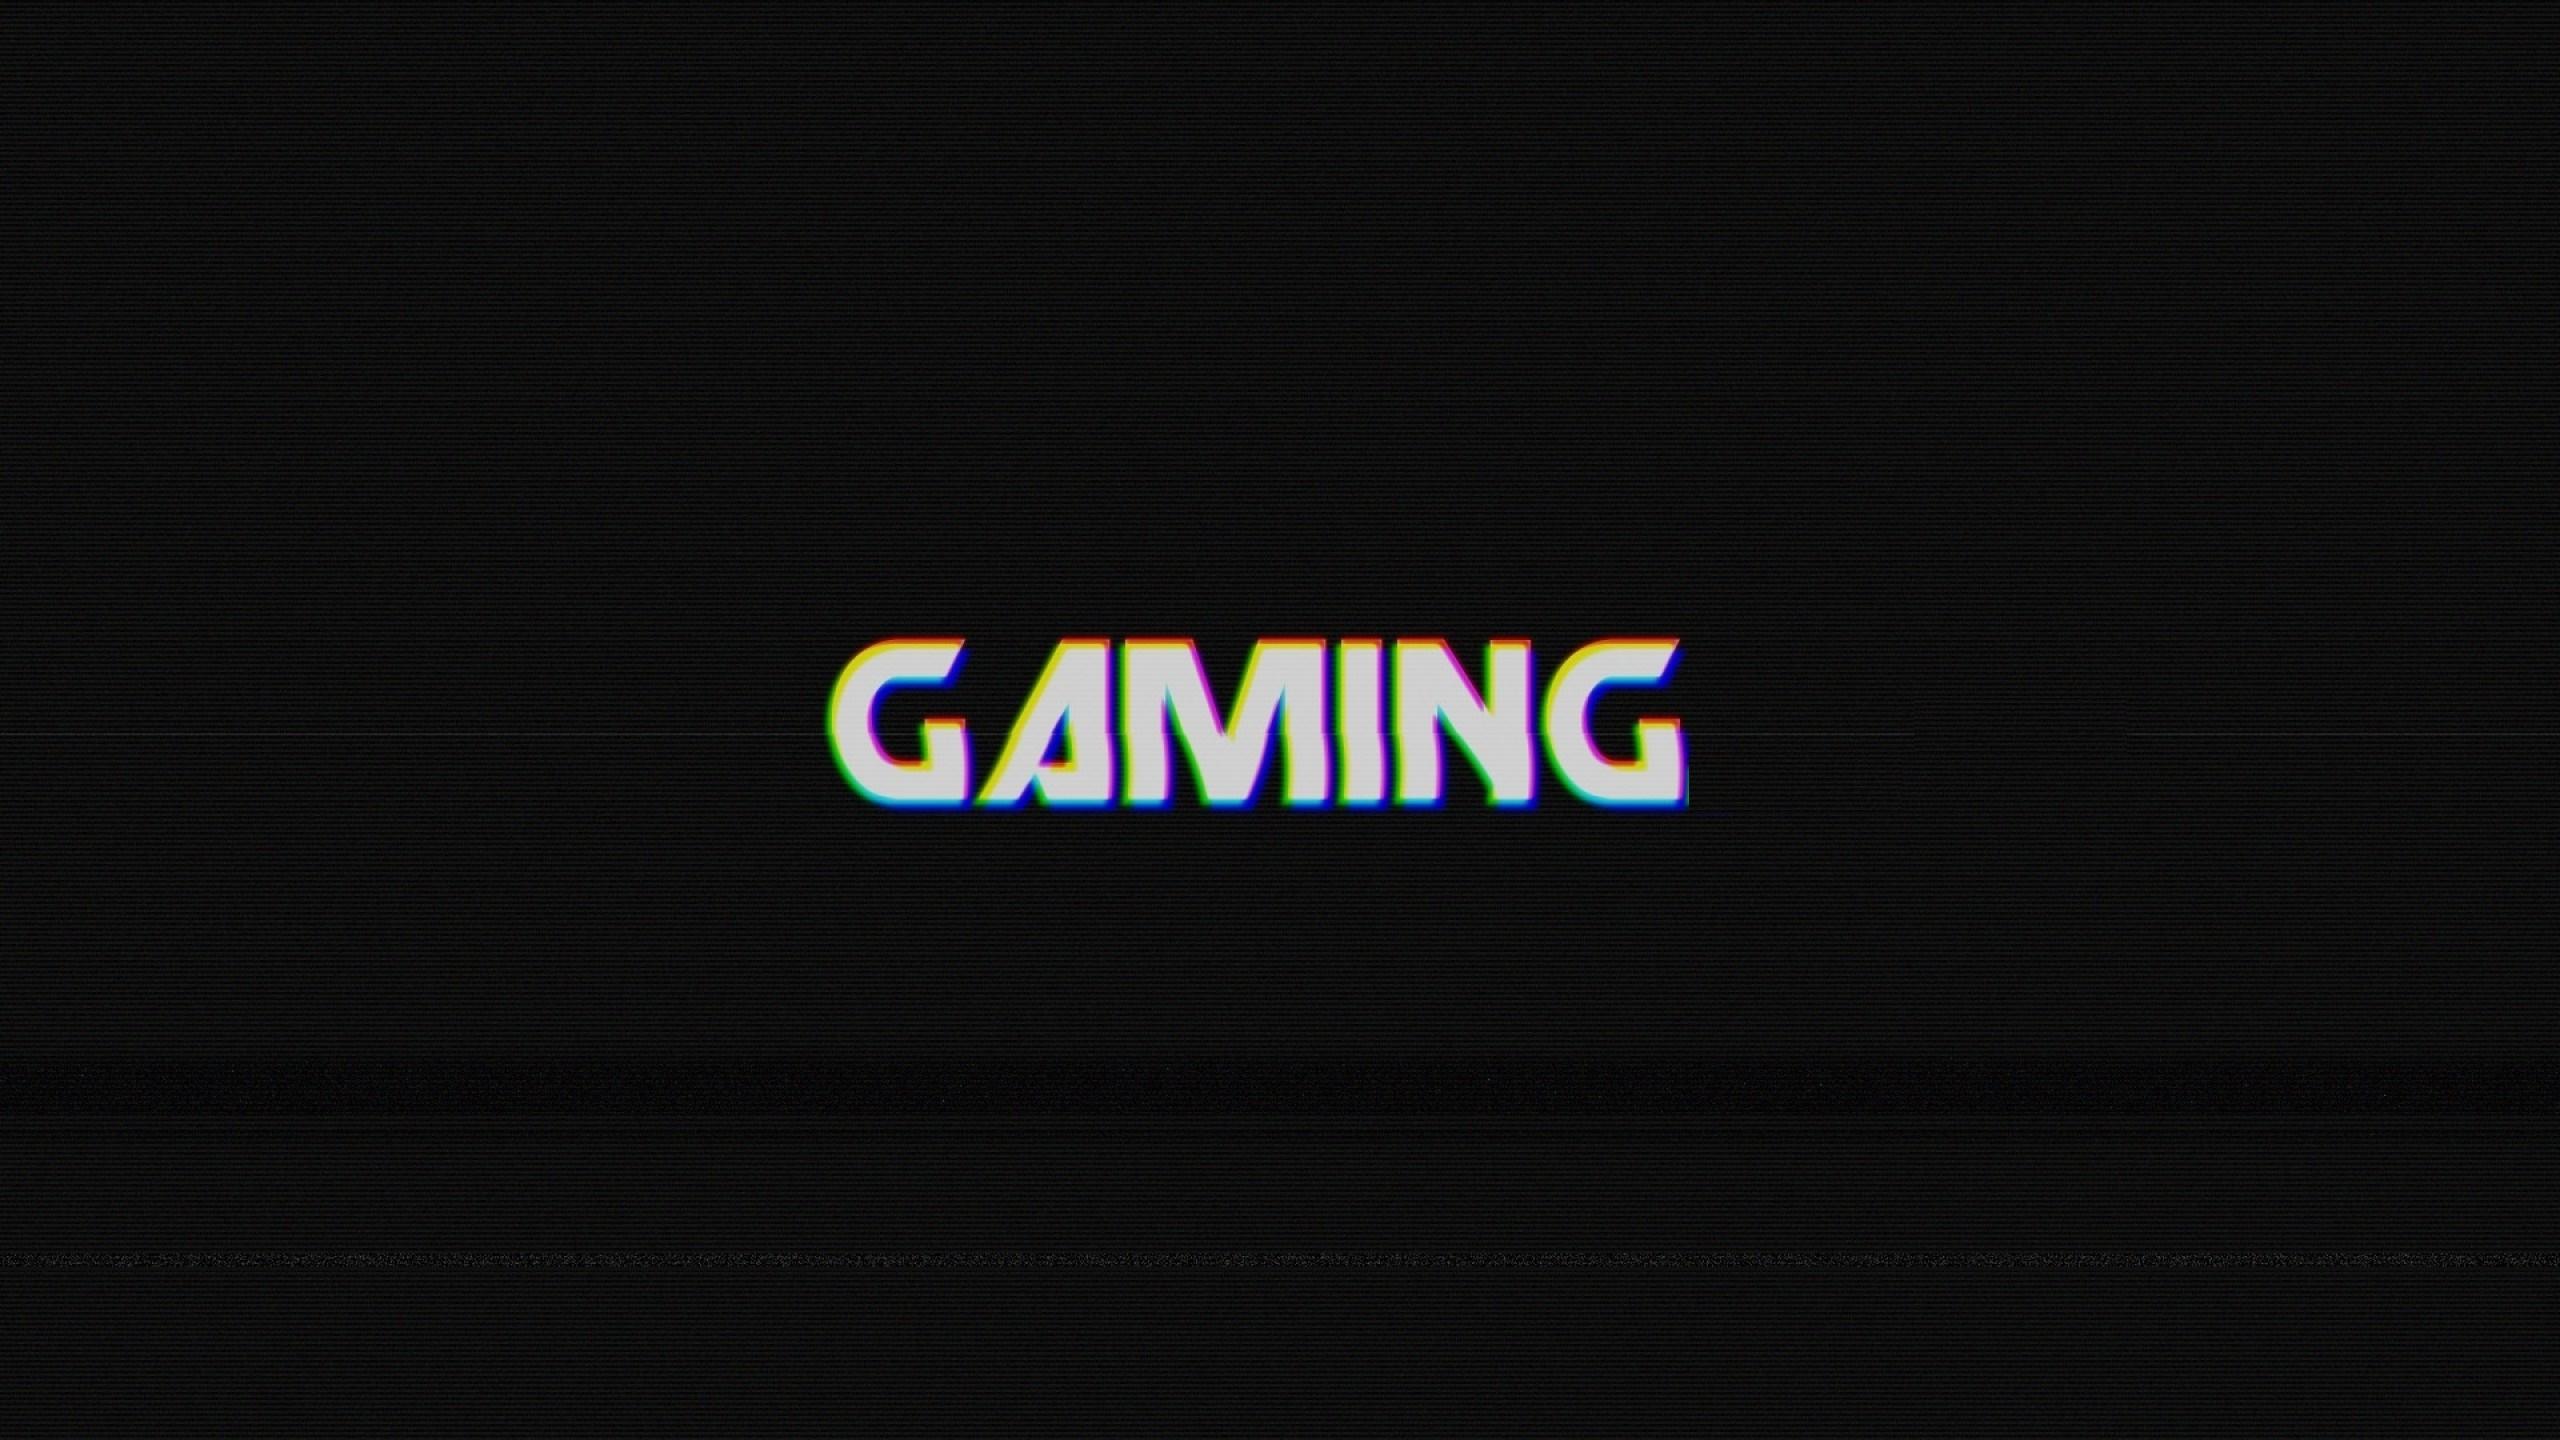 Asus 3d Wallpaper Hd Gaming Logo Wallpapers Pixelstalk Net